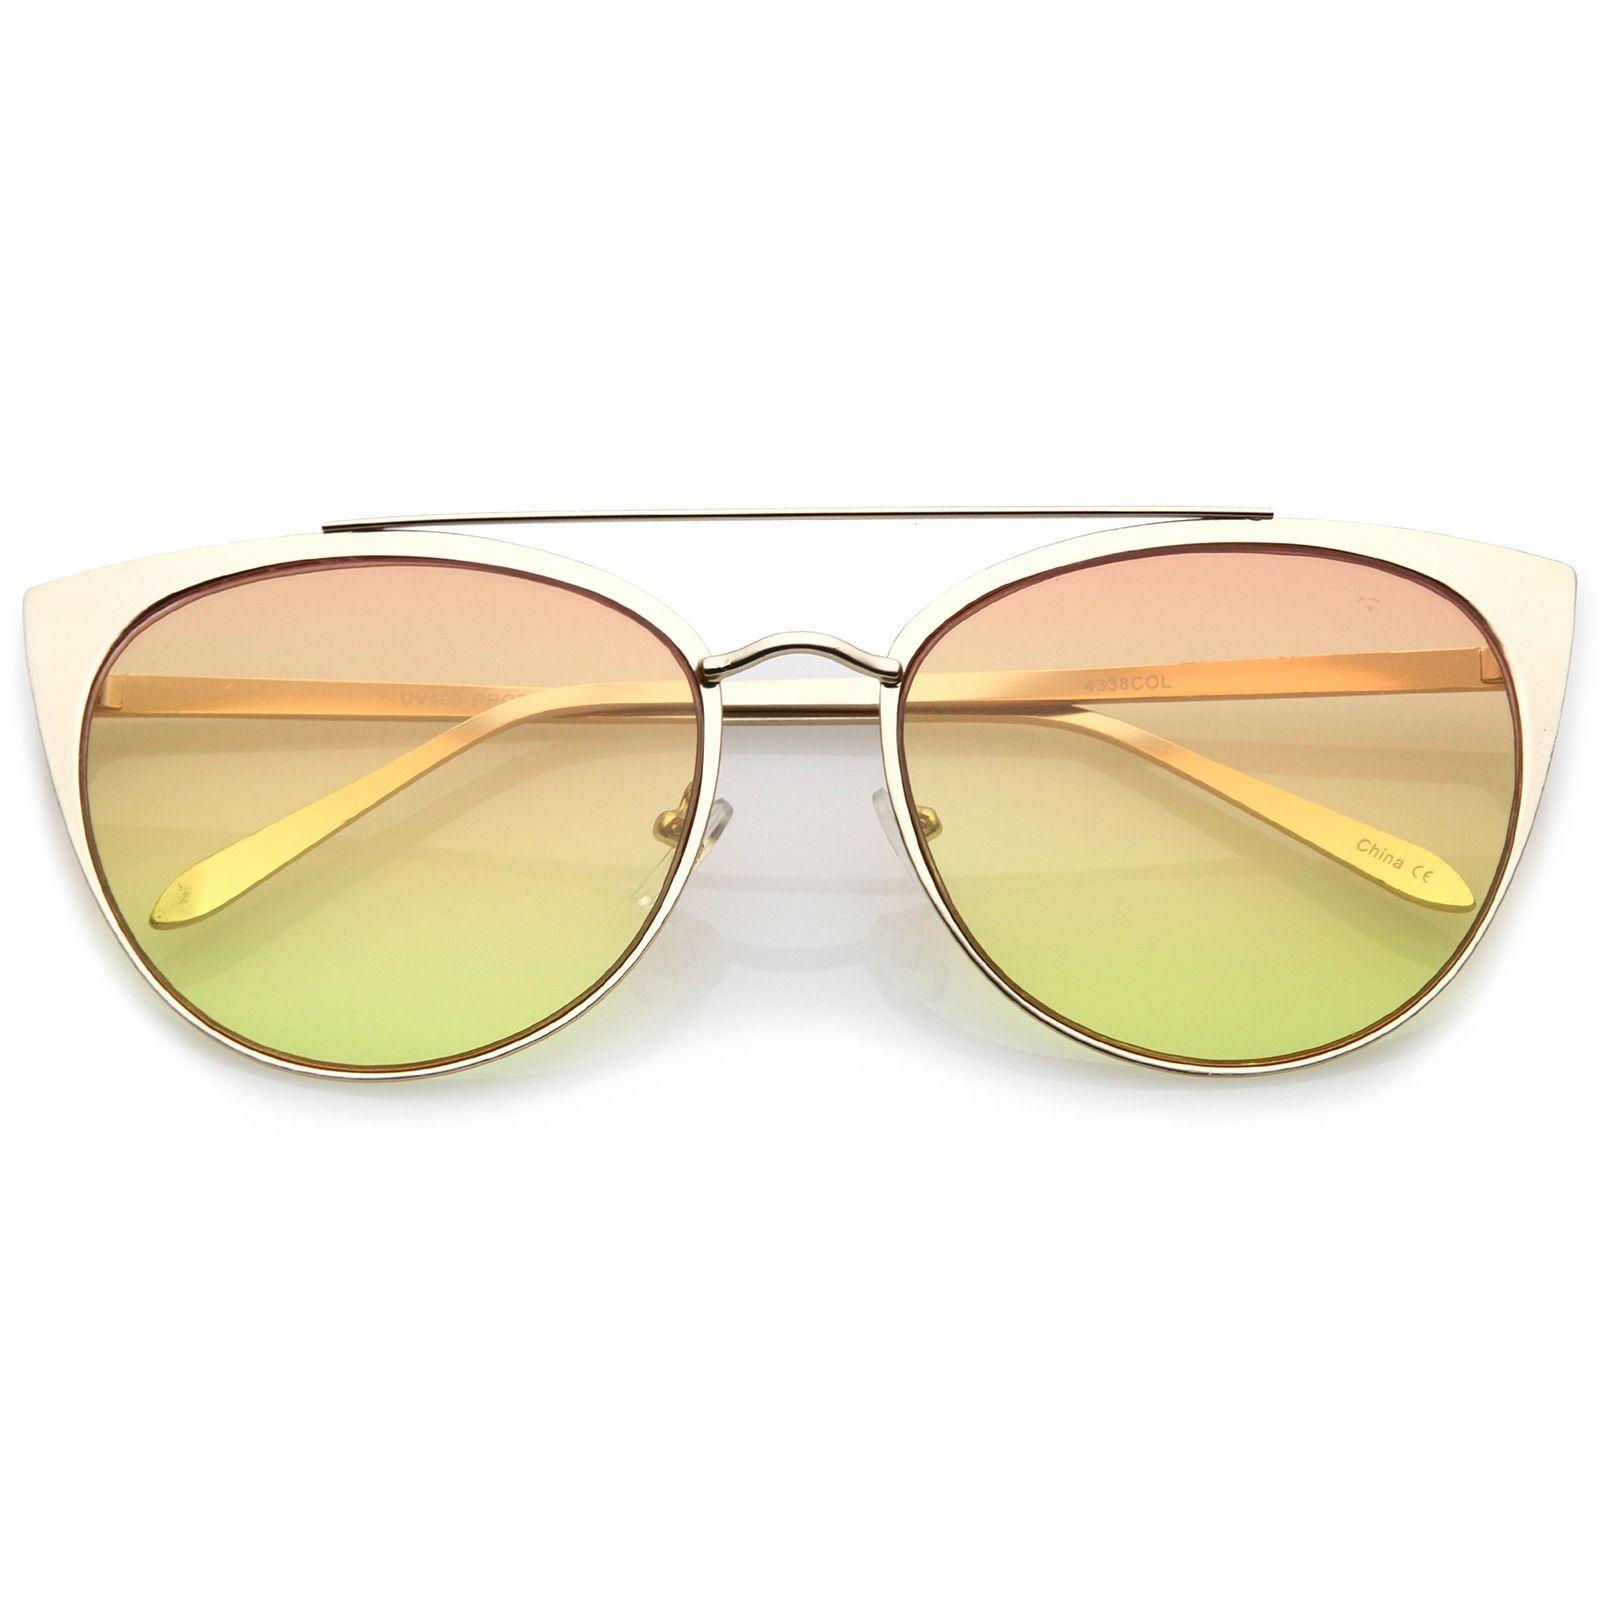 Women s Oversize Metal Crossbar Colored Flat Lens Cat Eye Sunglasses ... 9c8275f072